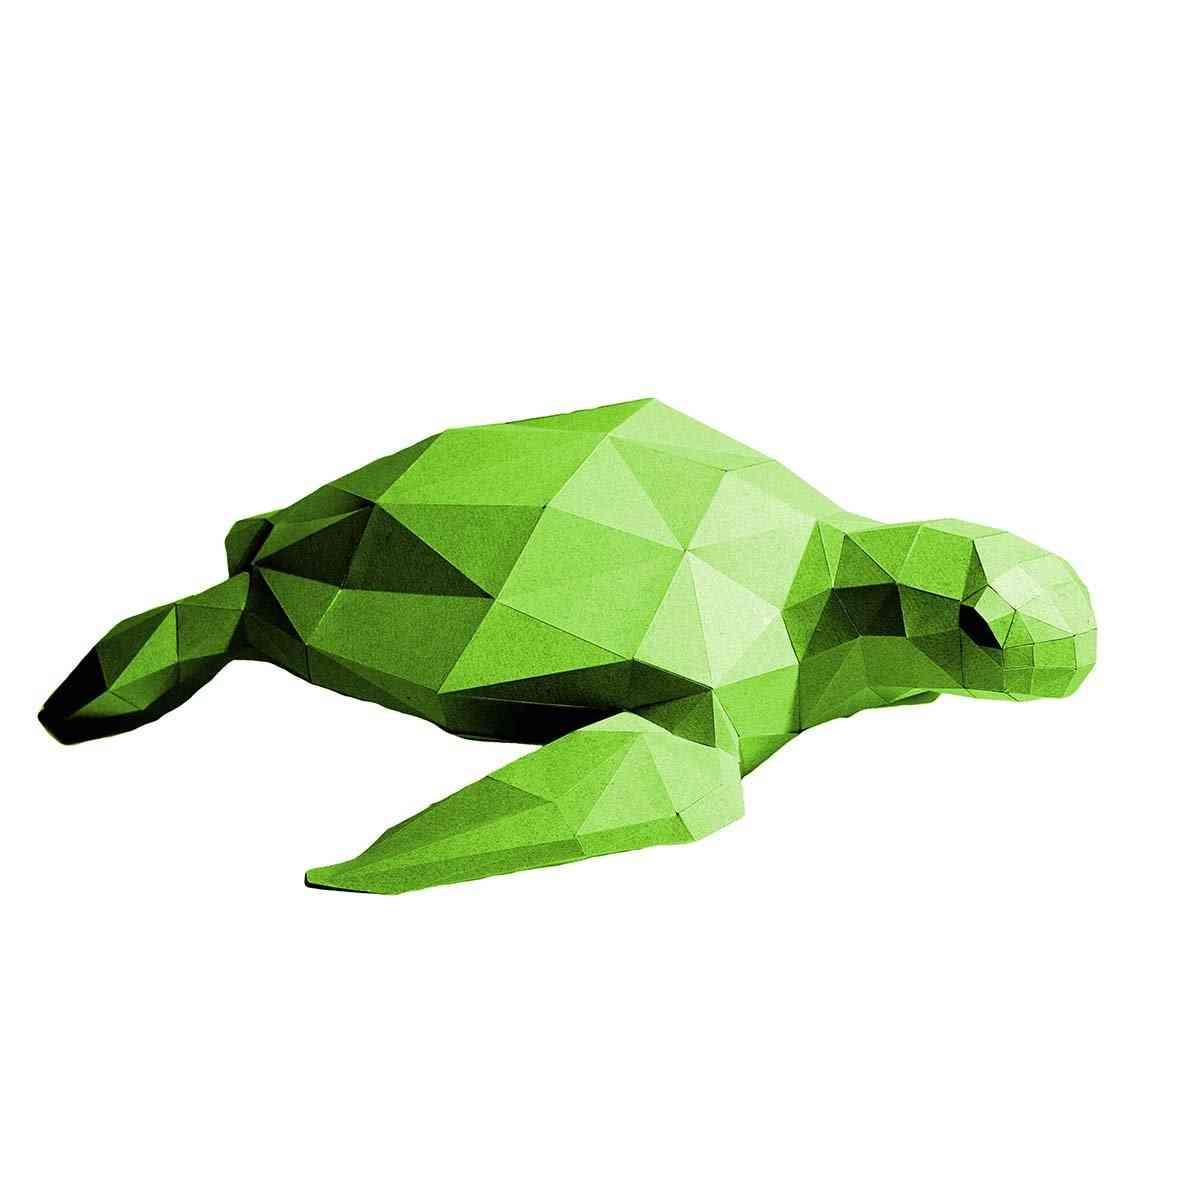 Sea Turtle Model